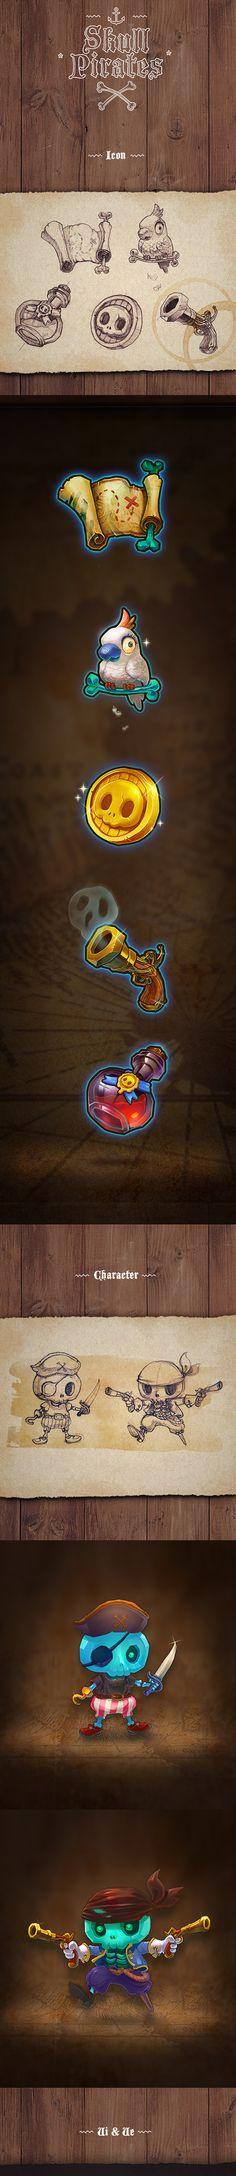 Skull Pirates Icon/UI/UX on Behance